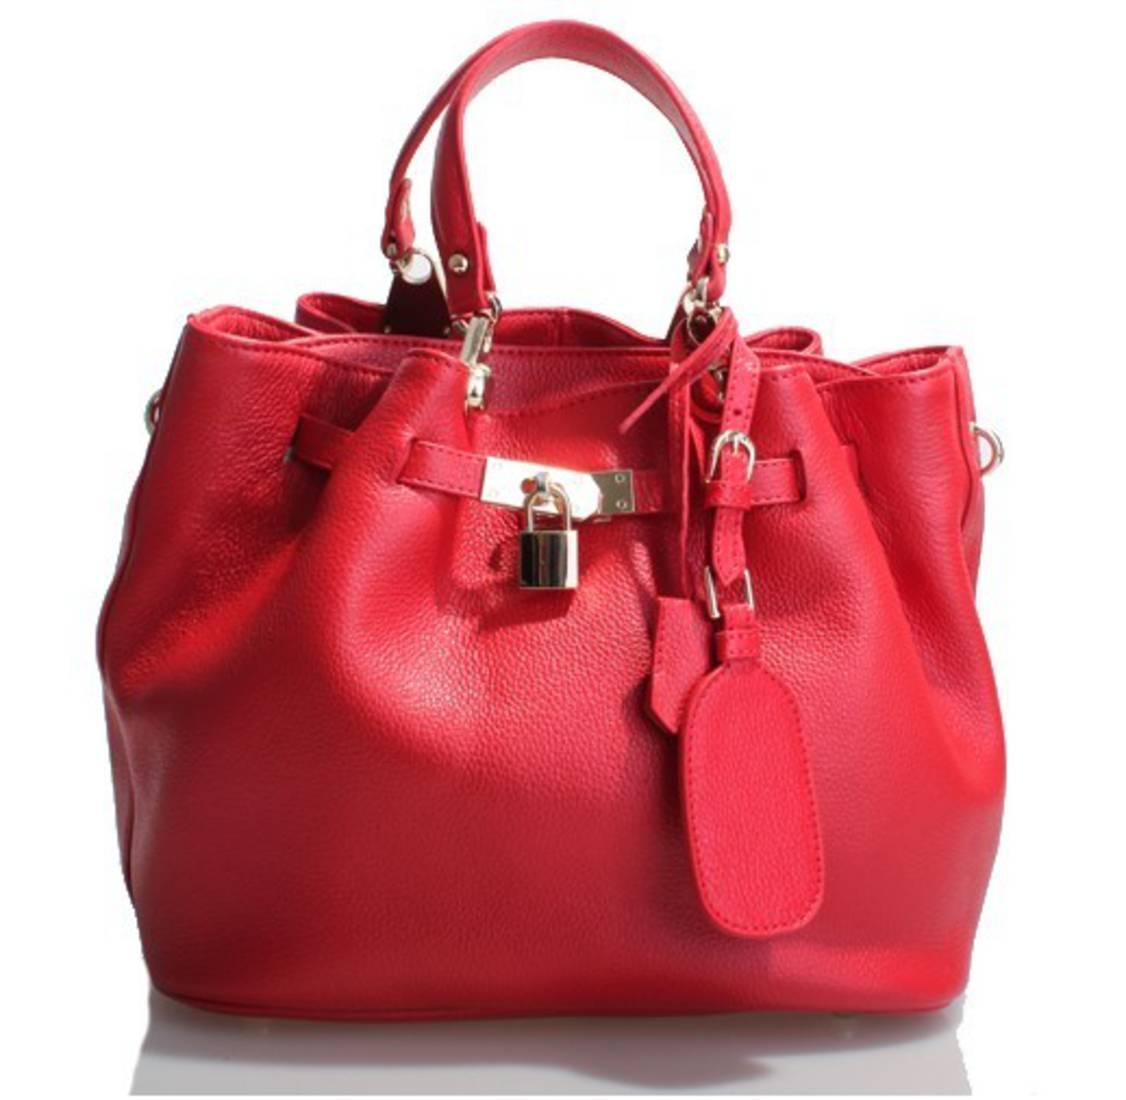 ☆ #beleza #look #roupas #estilo #moda #inspiração #tendências #lookdodia #acessórios http://t.co/ZJmJ3I41Bo